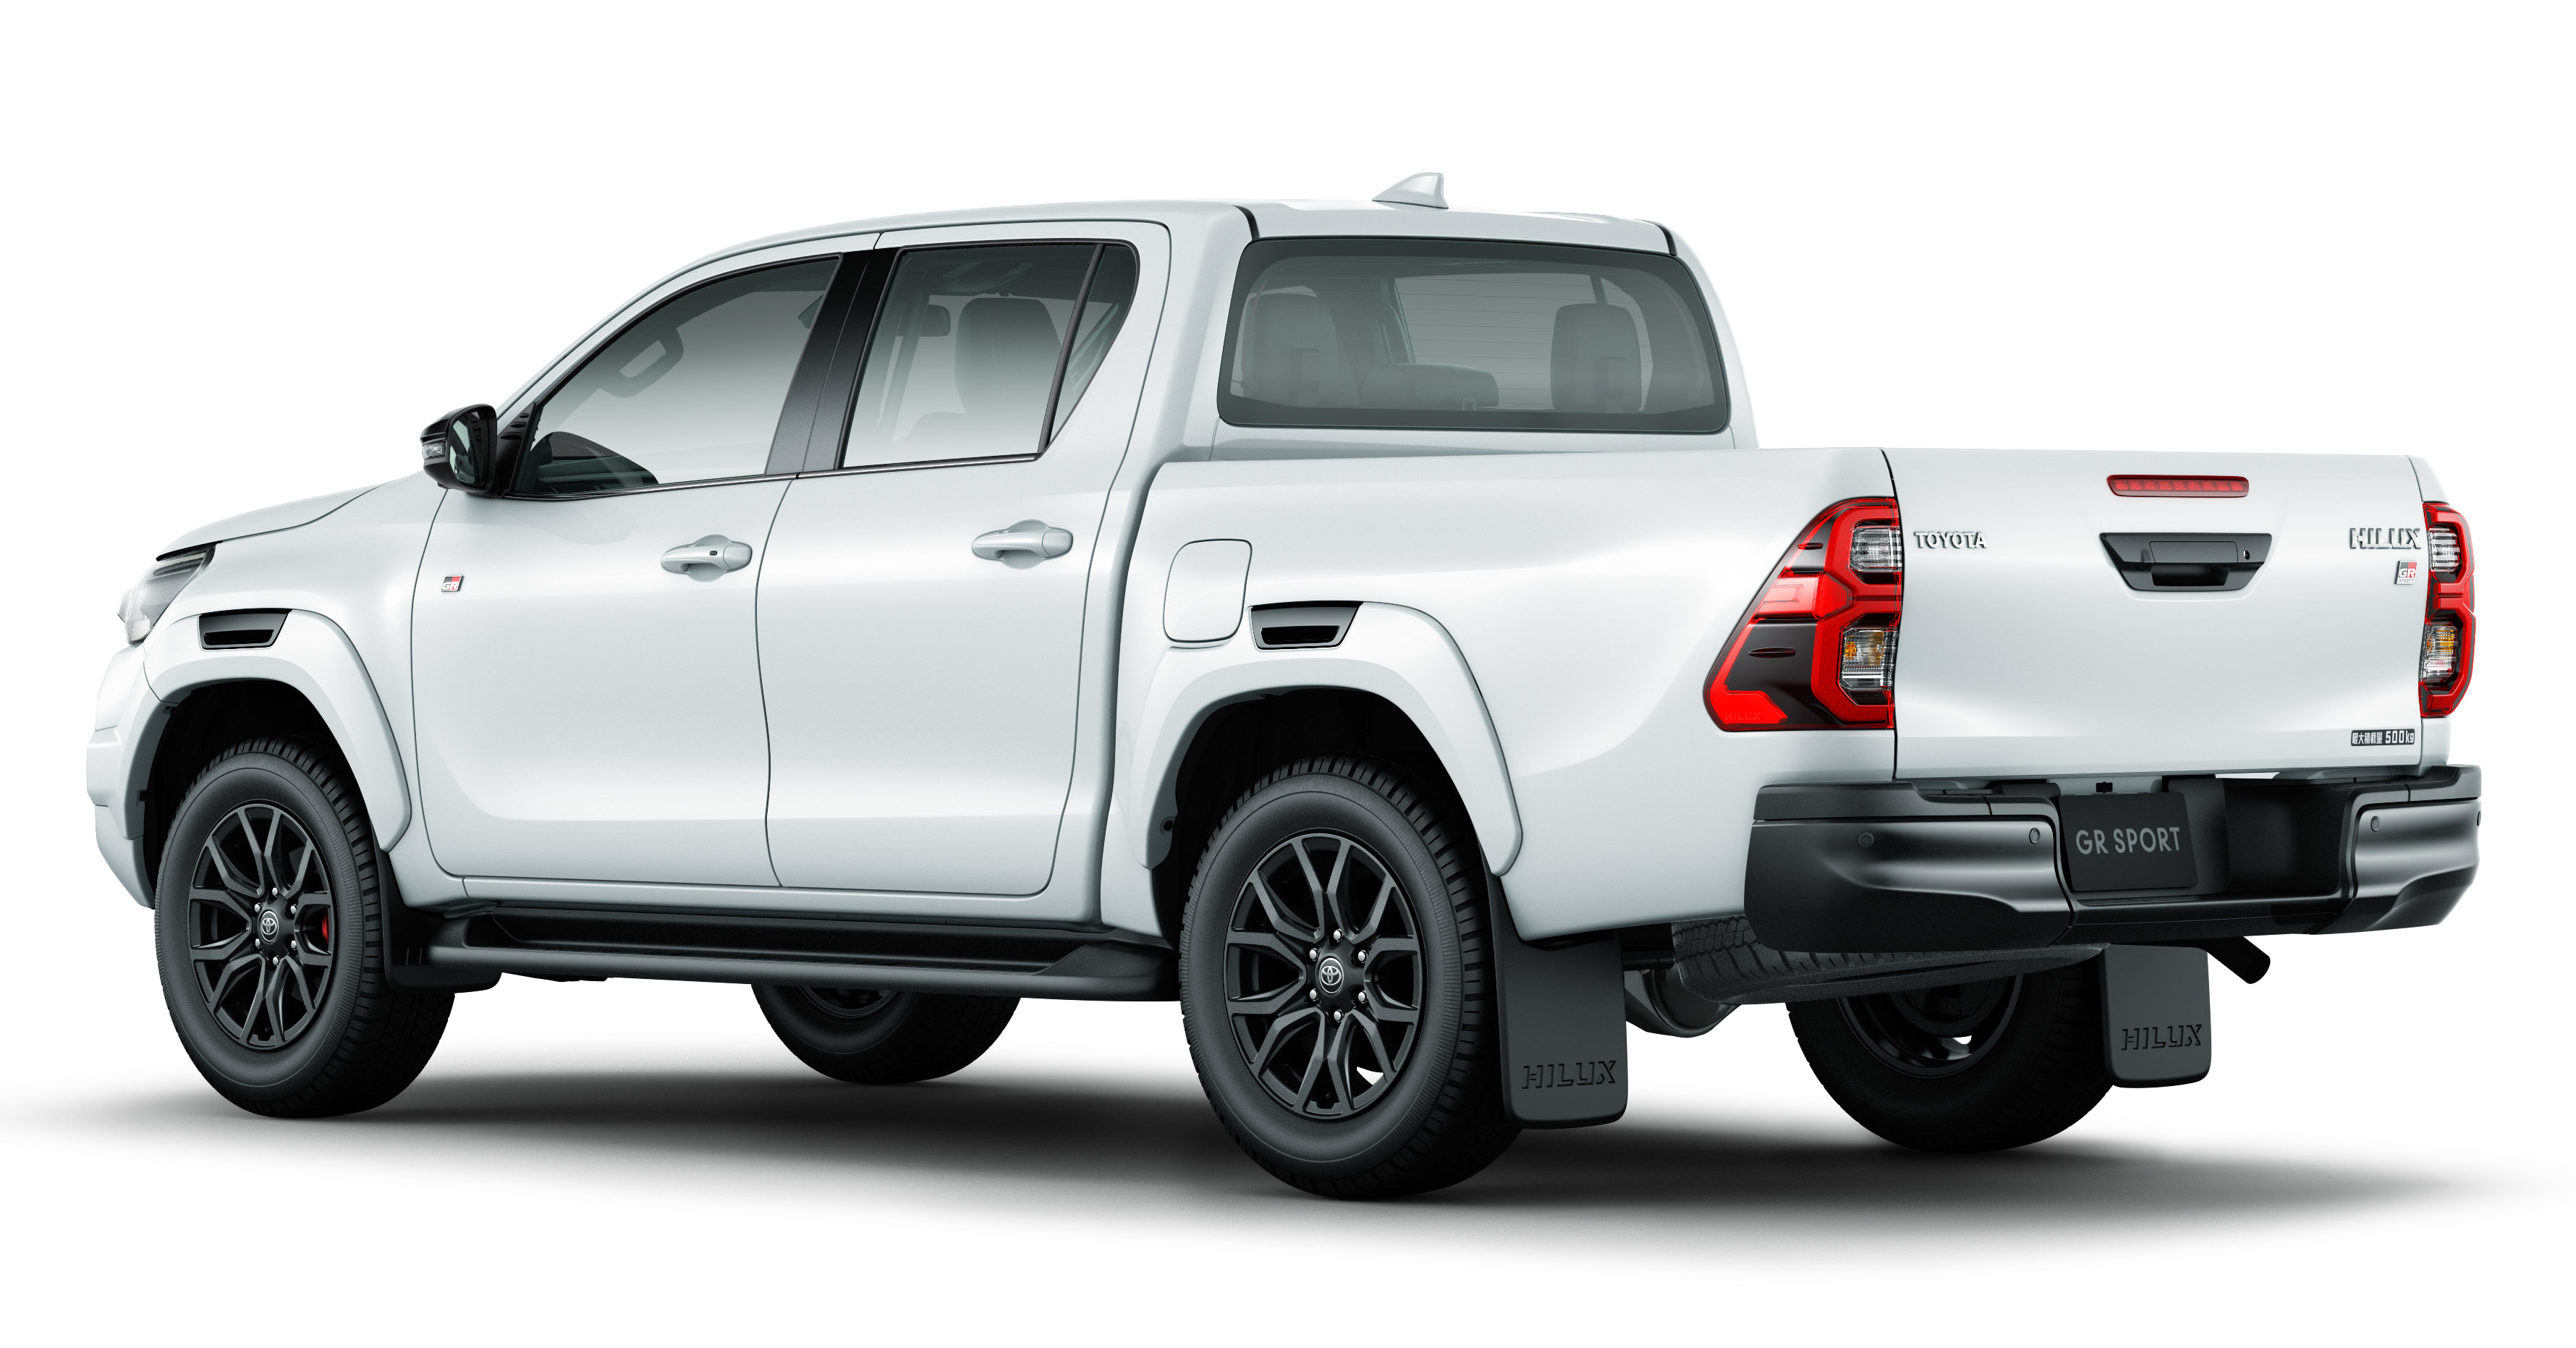 2022 Toyota Hilux Z GR Sport-Japan-3